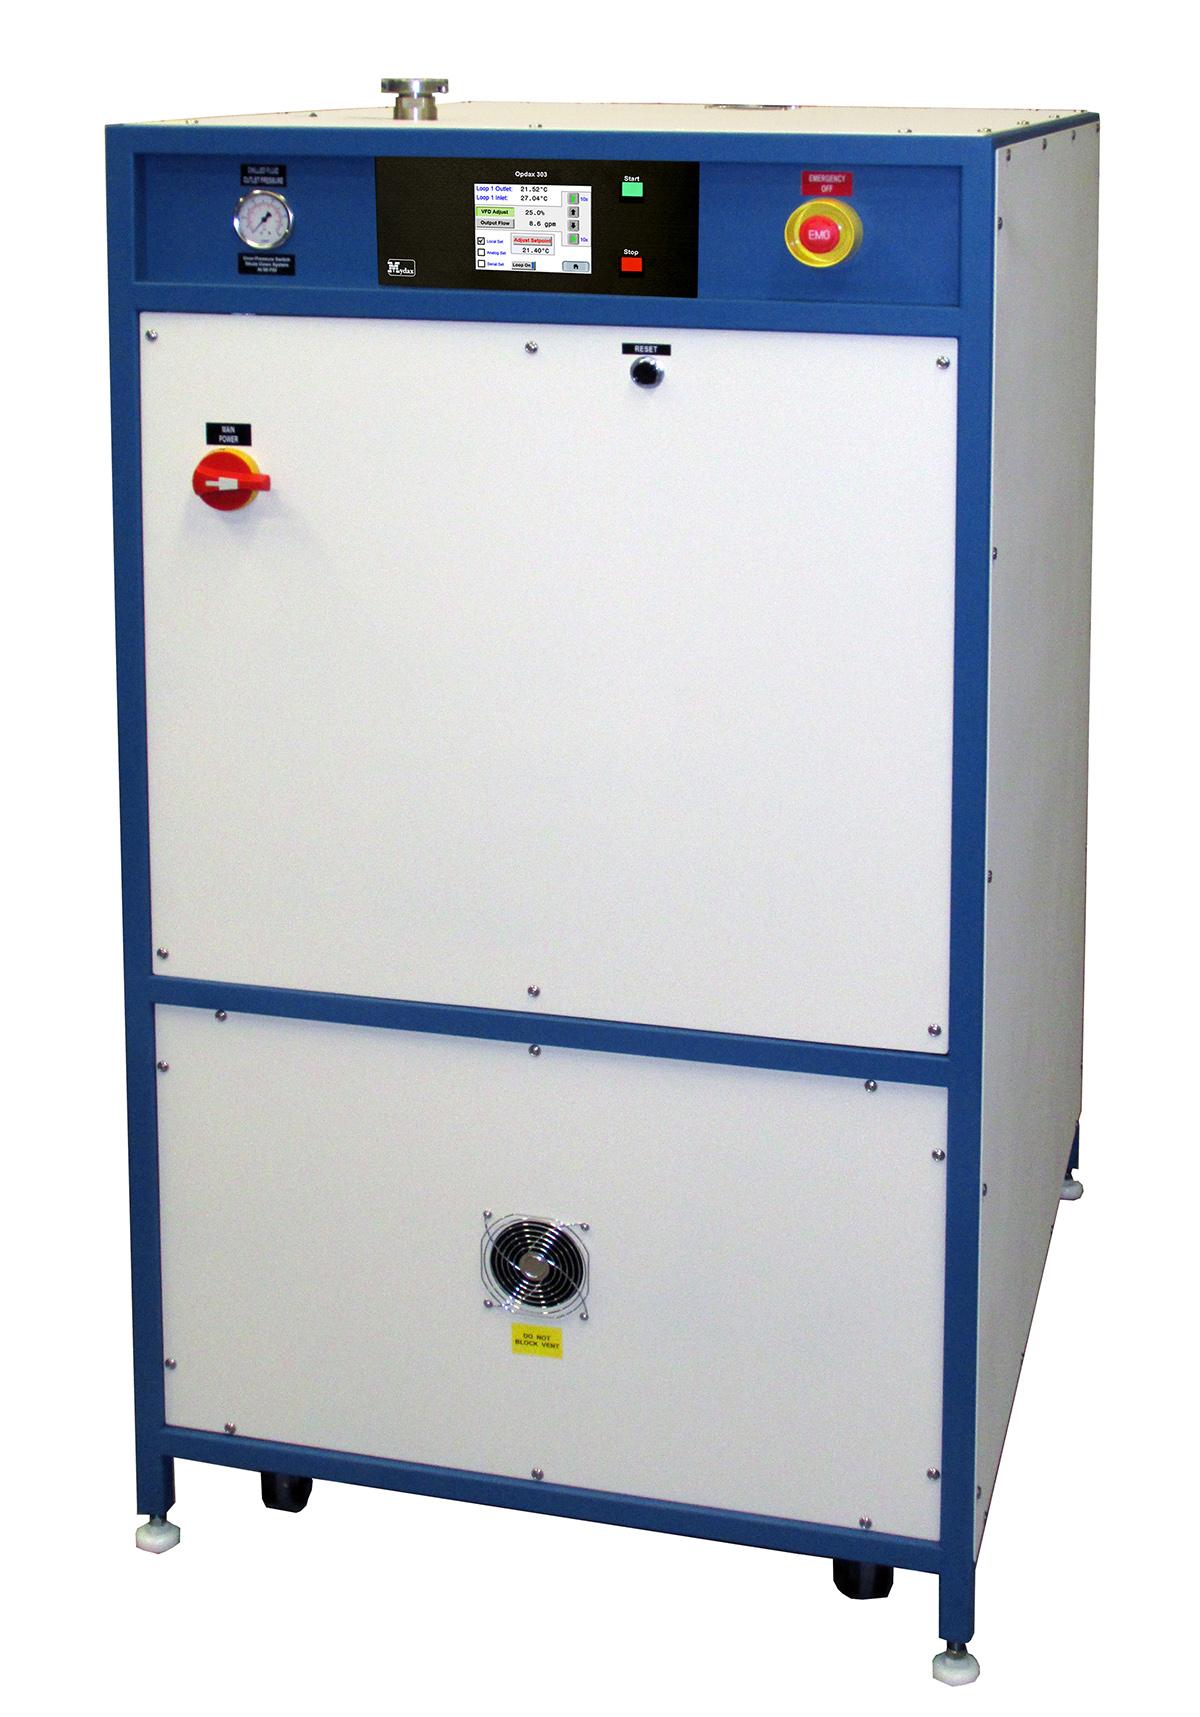 CryoDax 16 Low Temperature Liquid Chiller System